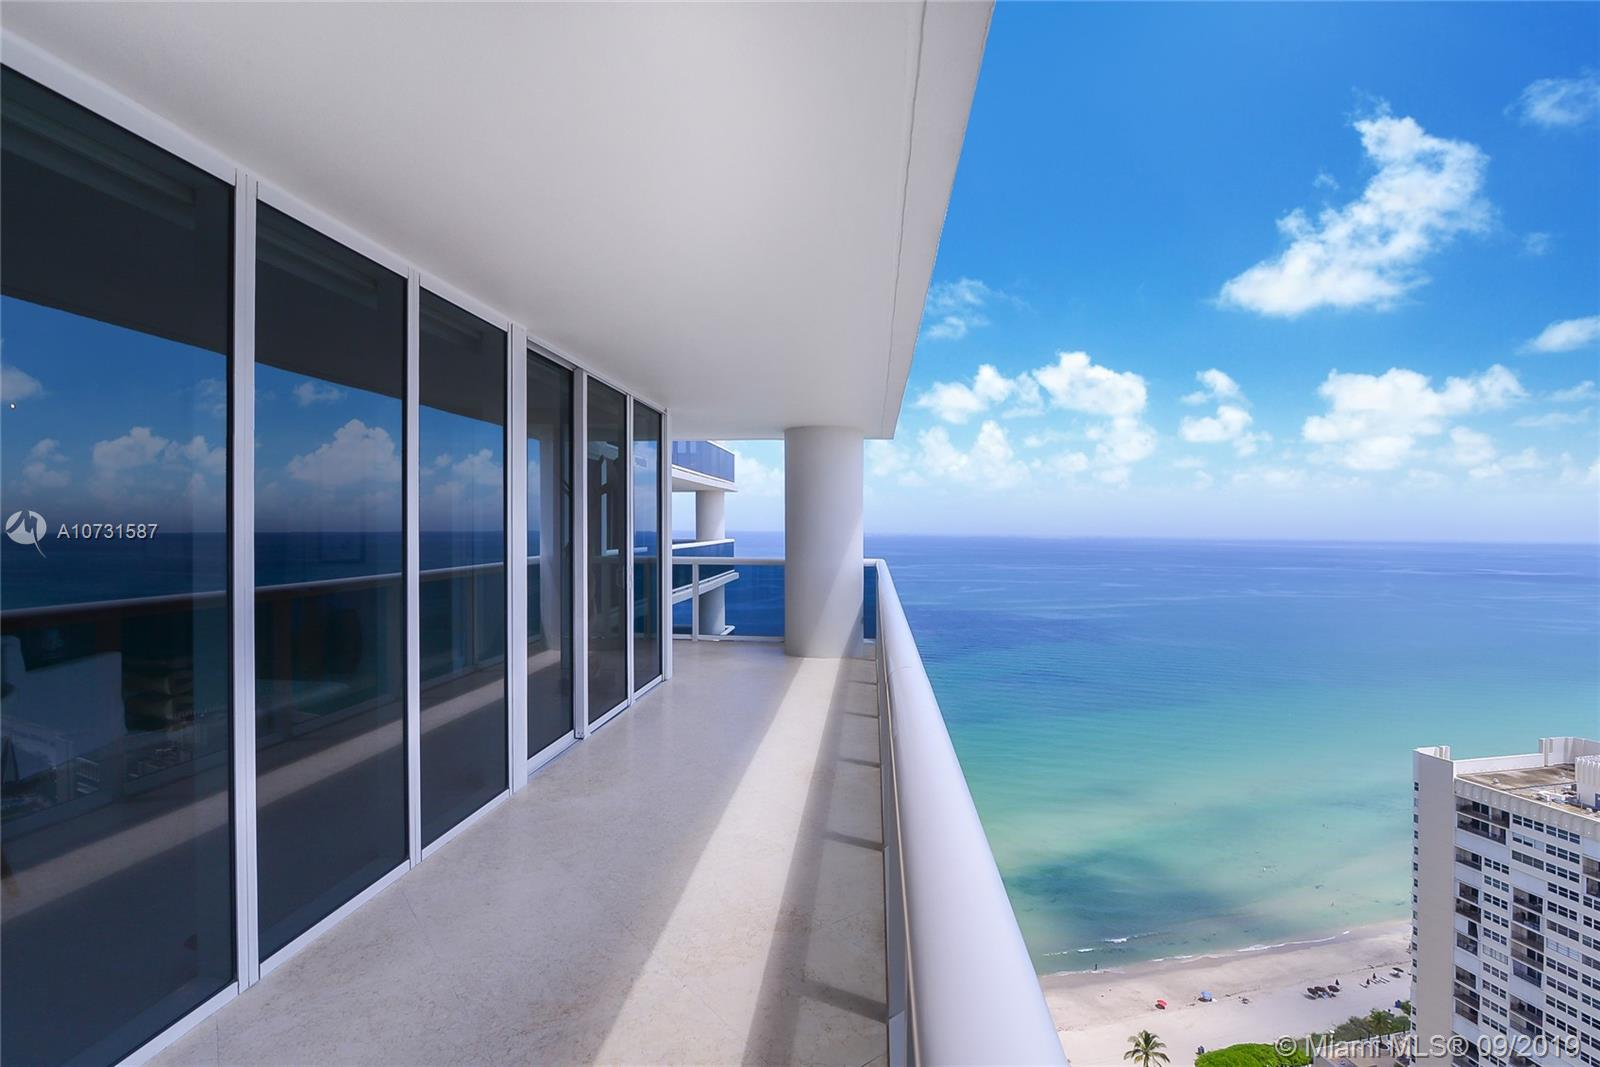 Beach Club Towers #3605 - 06 - photo